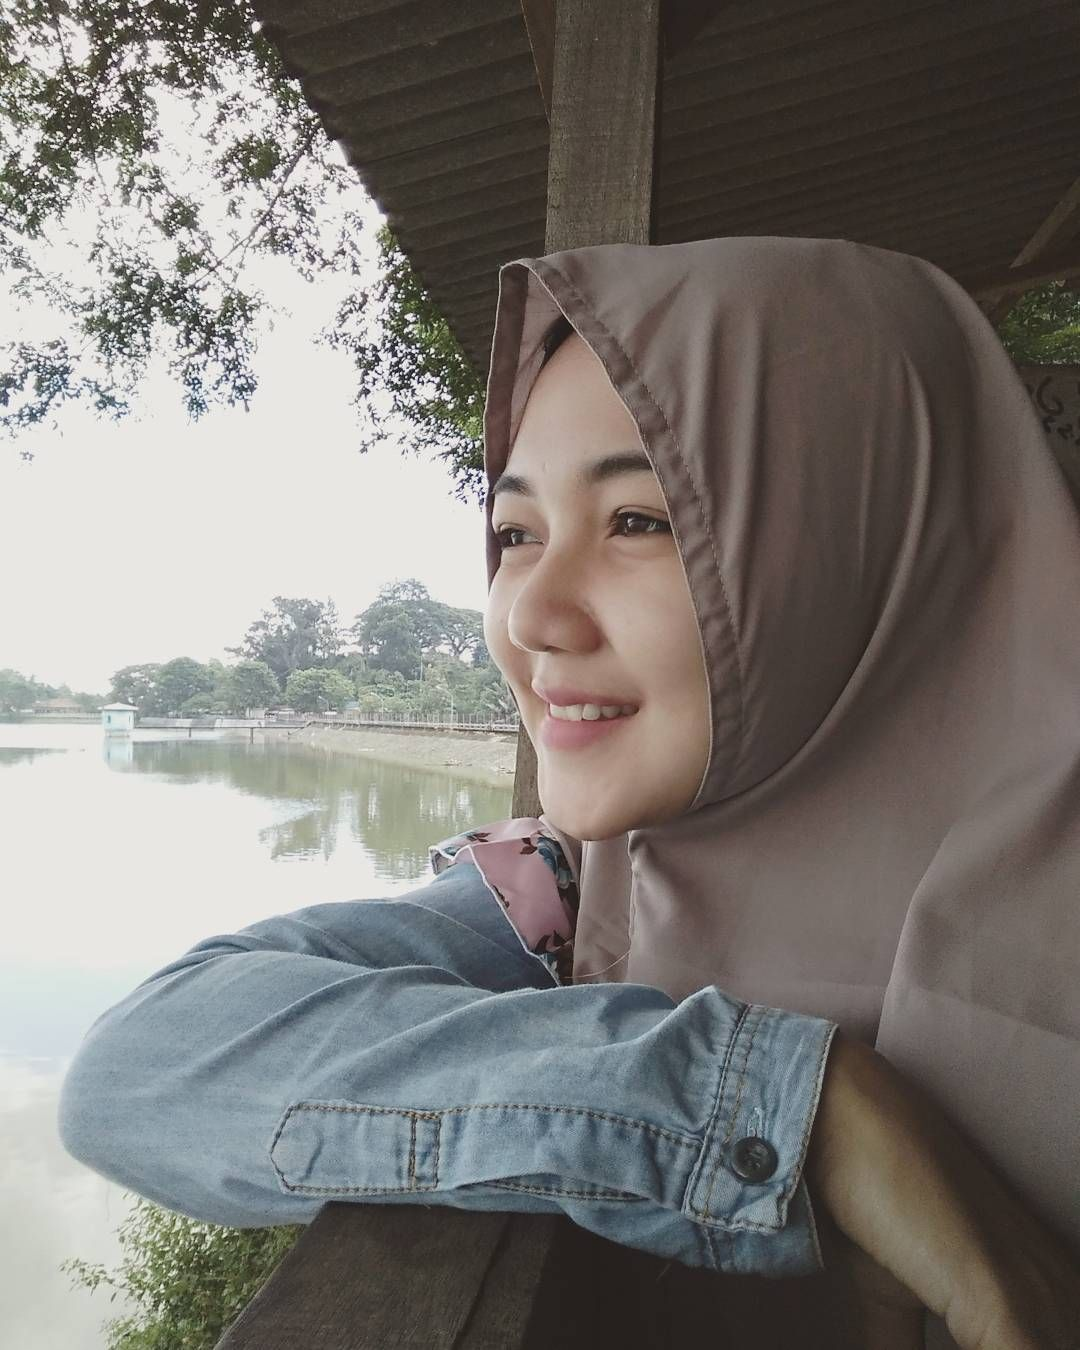 Gambar Mungkin Berisi 1 Orang Model Pakaian Muslim Hijab Chic Wanita